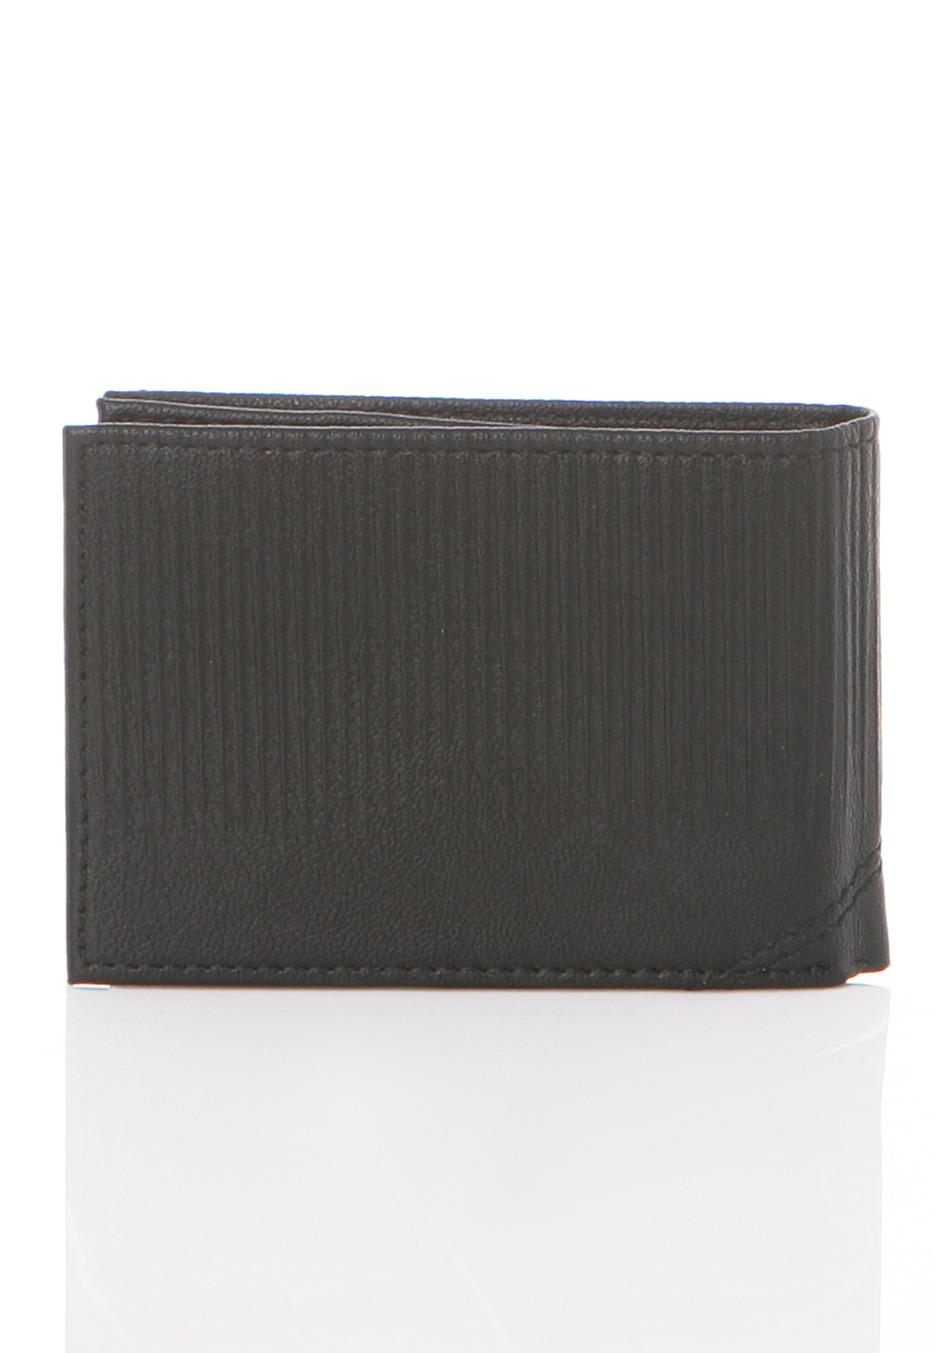 Billabong - Segment - Wallet - Streetwear Shop - Impericon.com Worldwide 690ec741d08b4